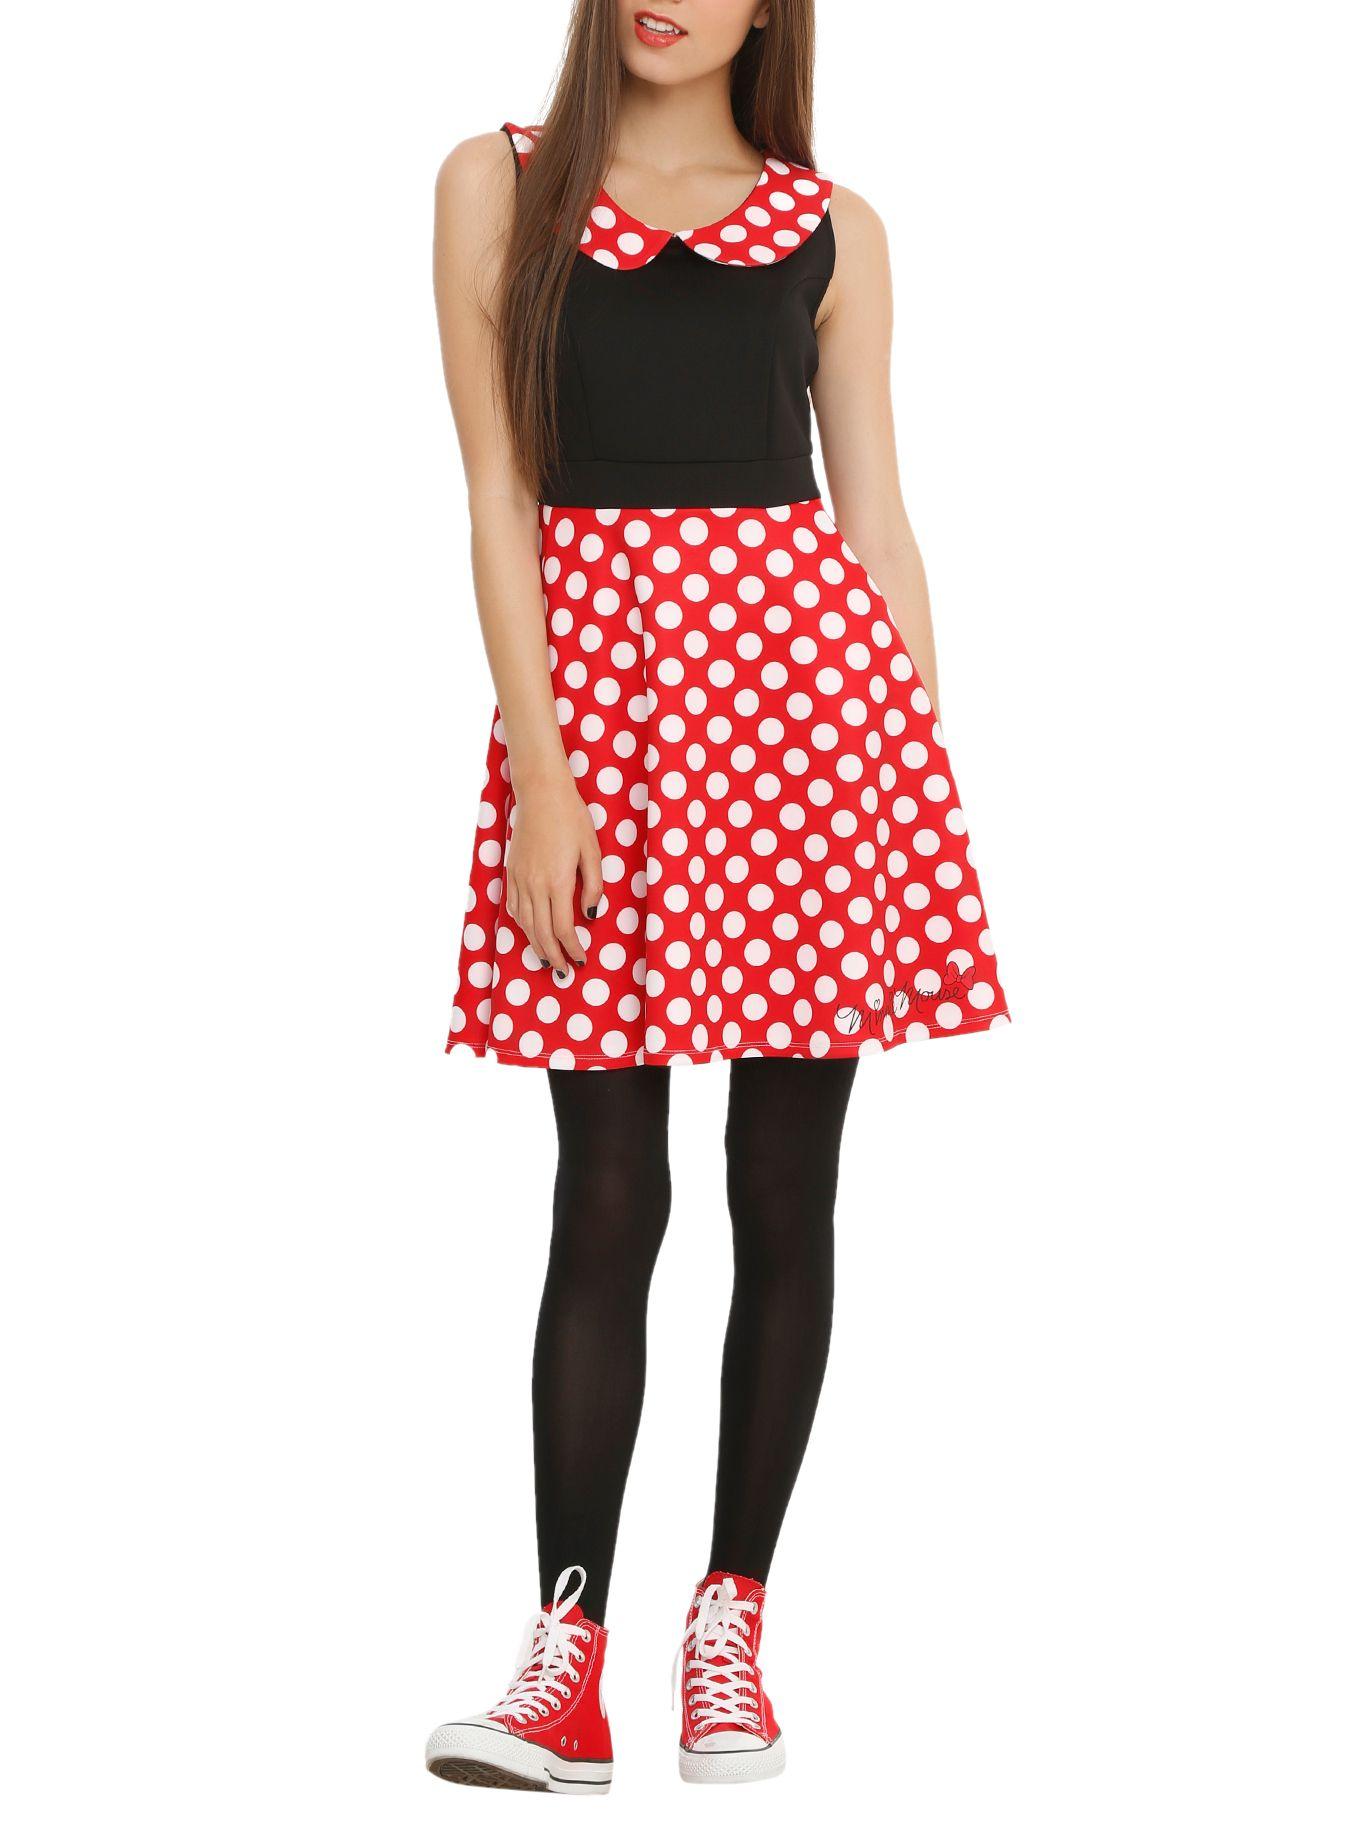 Disney Minnie Mouse Polka Dot Dress | Hot Topic | Dresses | Pinterest